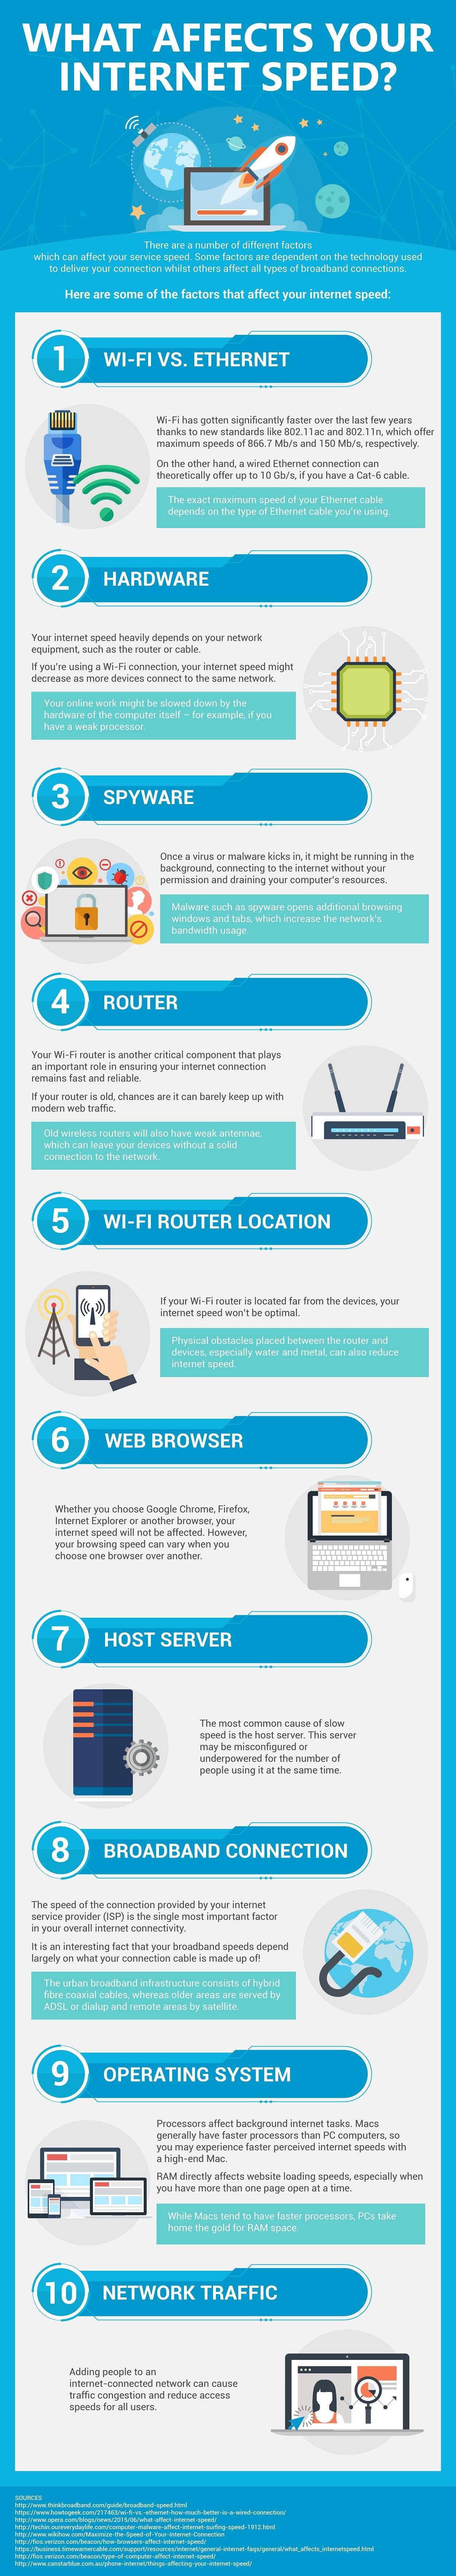 Internet Speed Factors Infographic